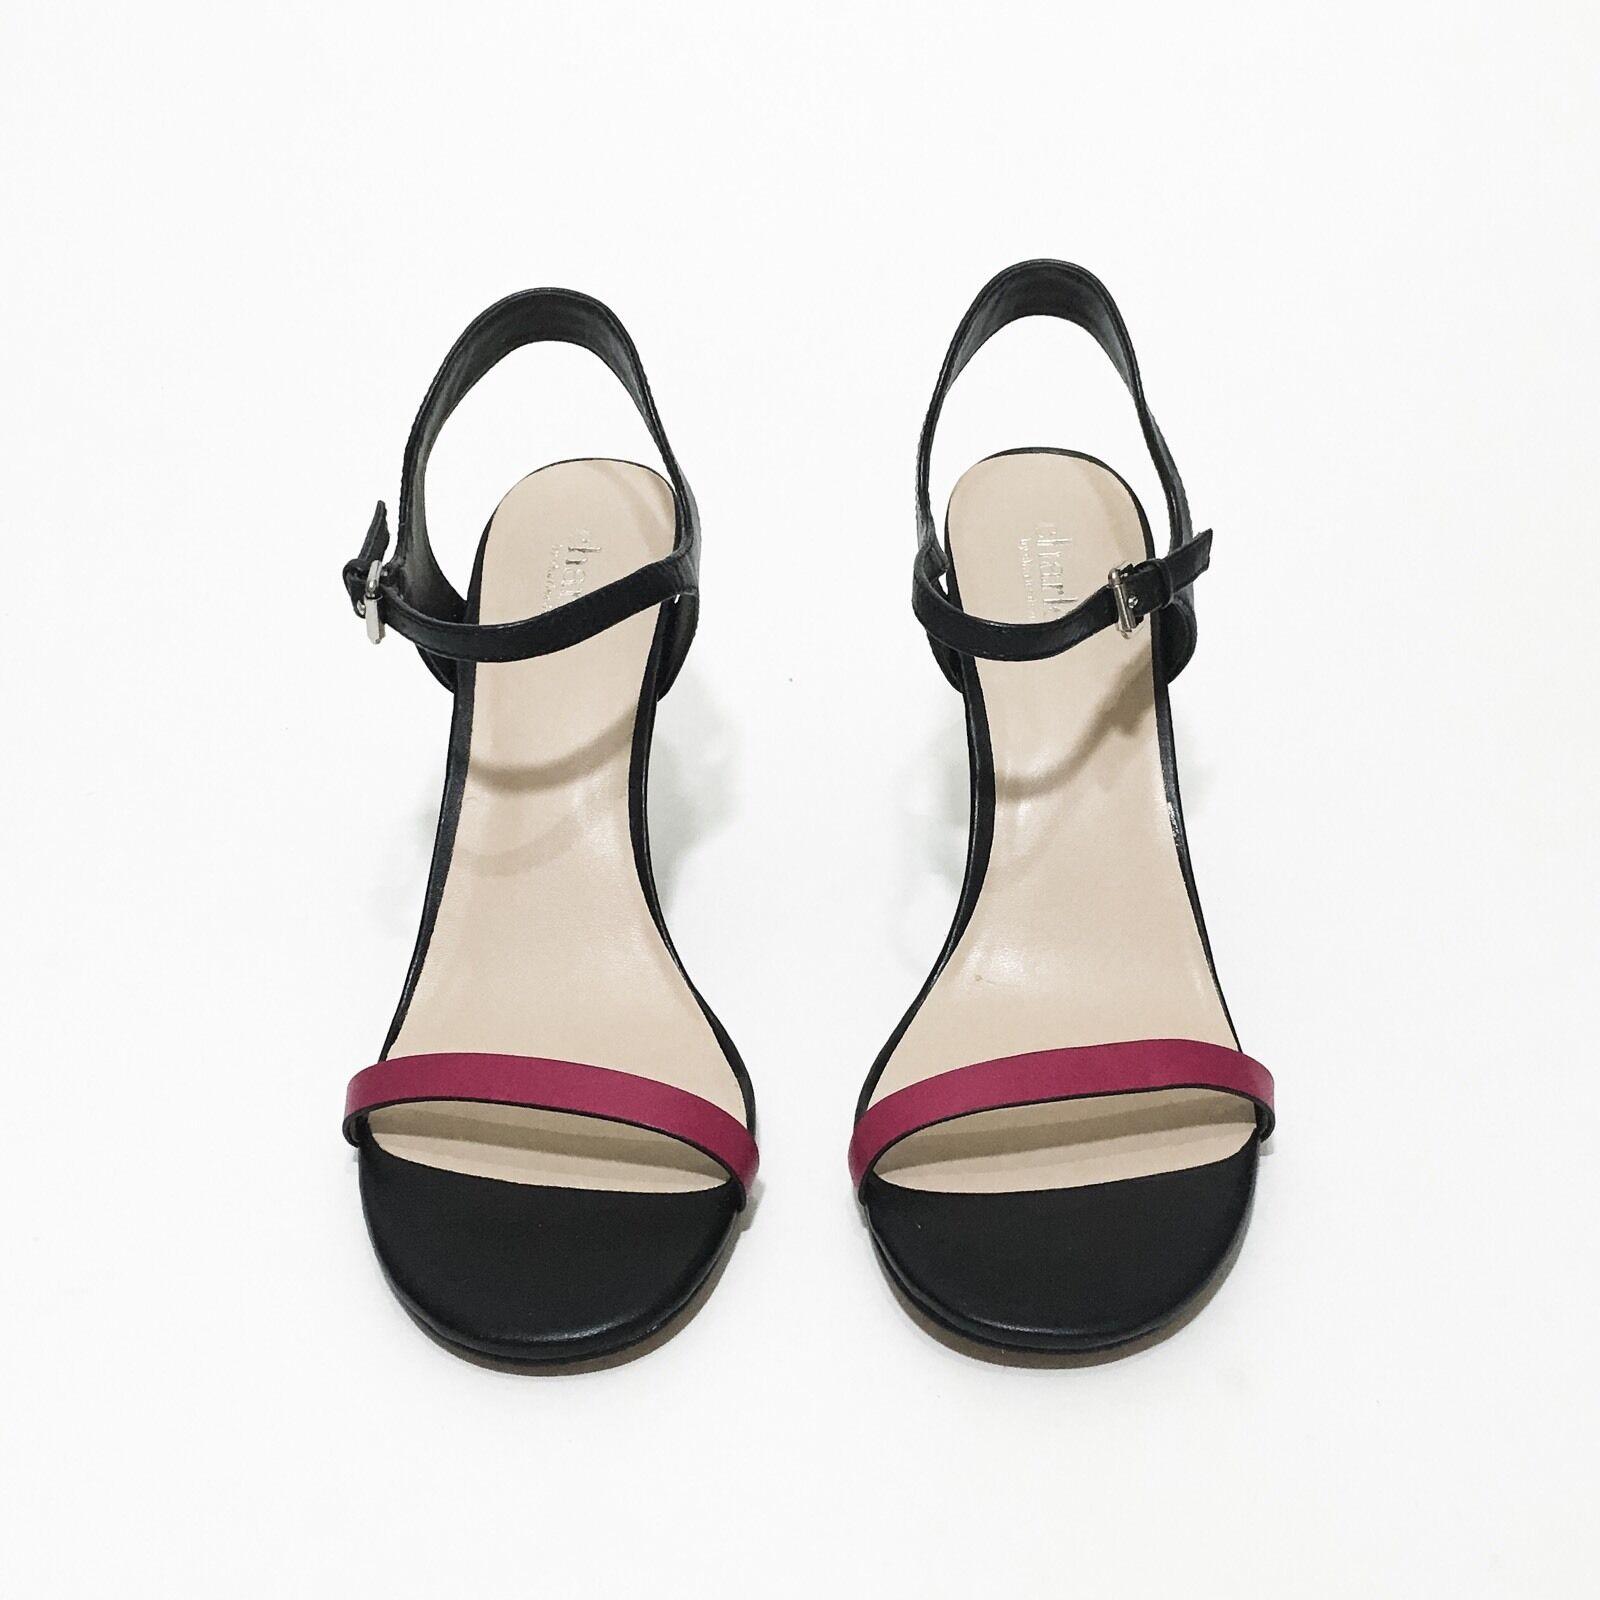 NEW Charles David Women Fuchsia Black Reverse Sandal Heels shoes Size 9.5